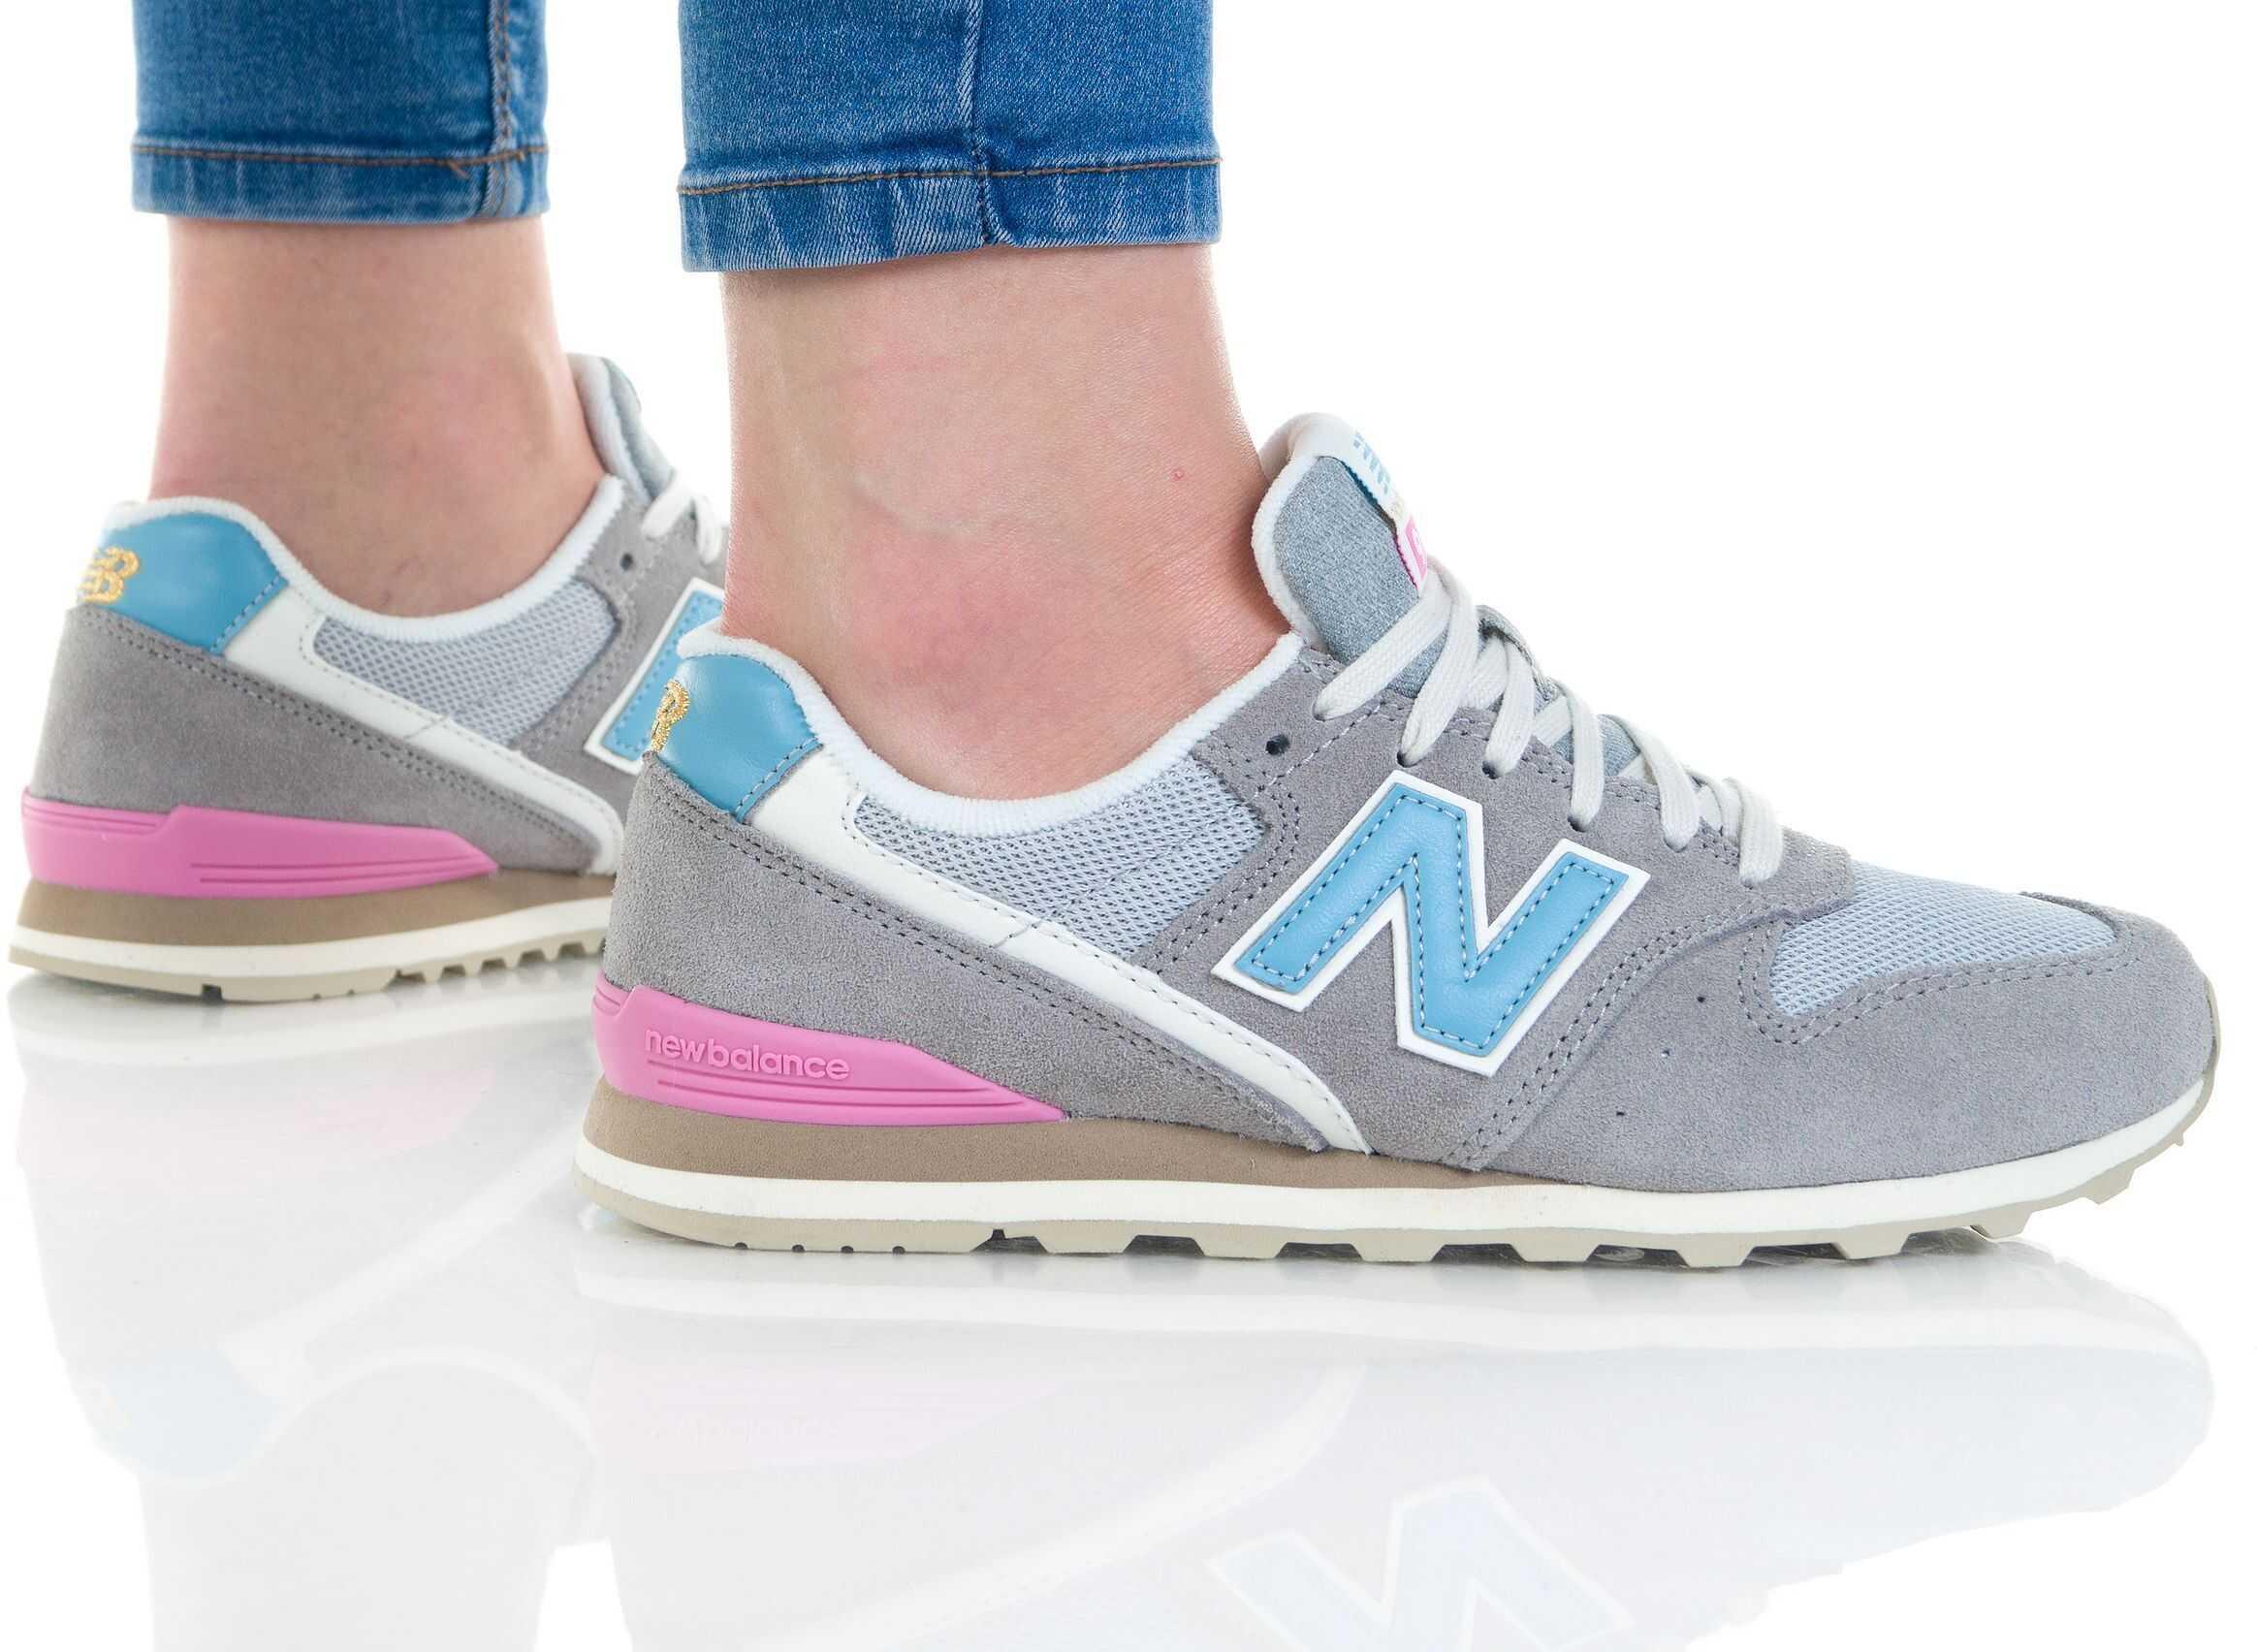 New Balance 996 Gri/Argintiu